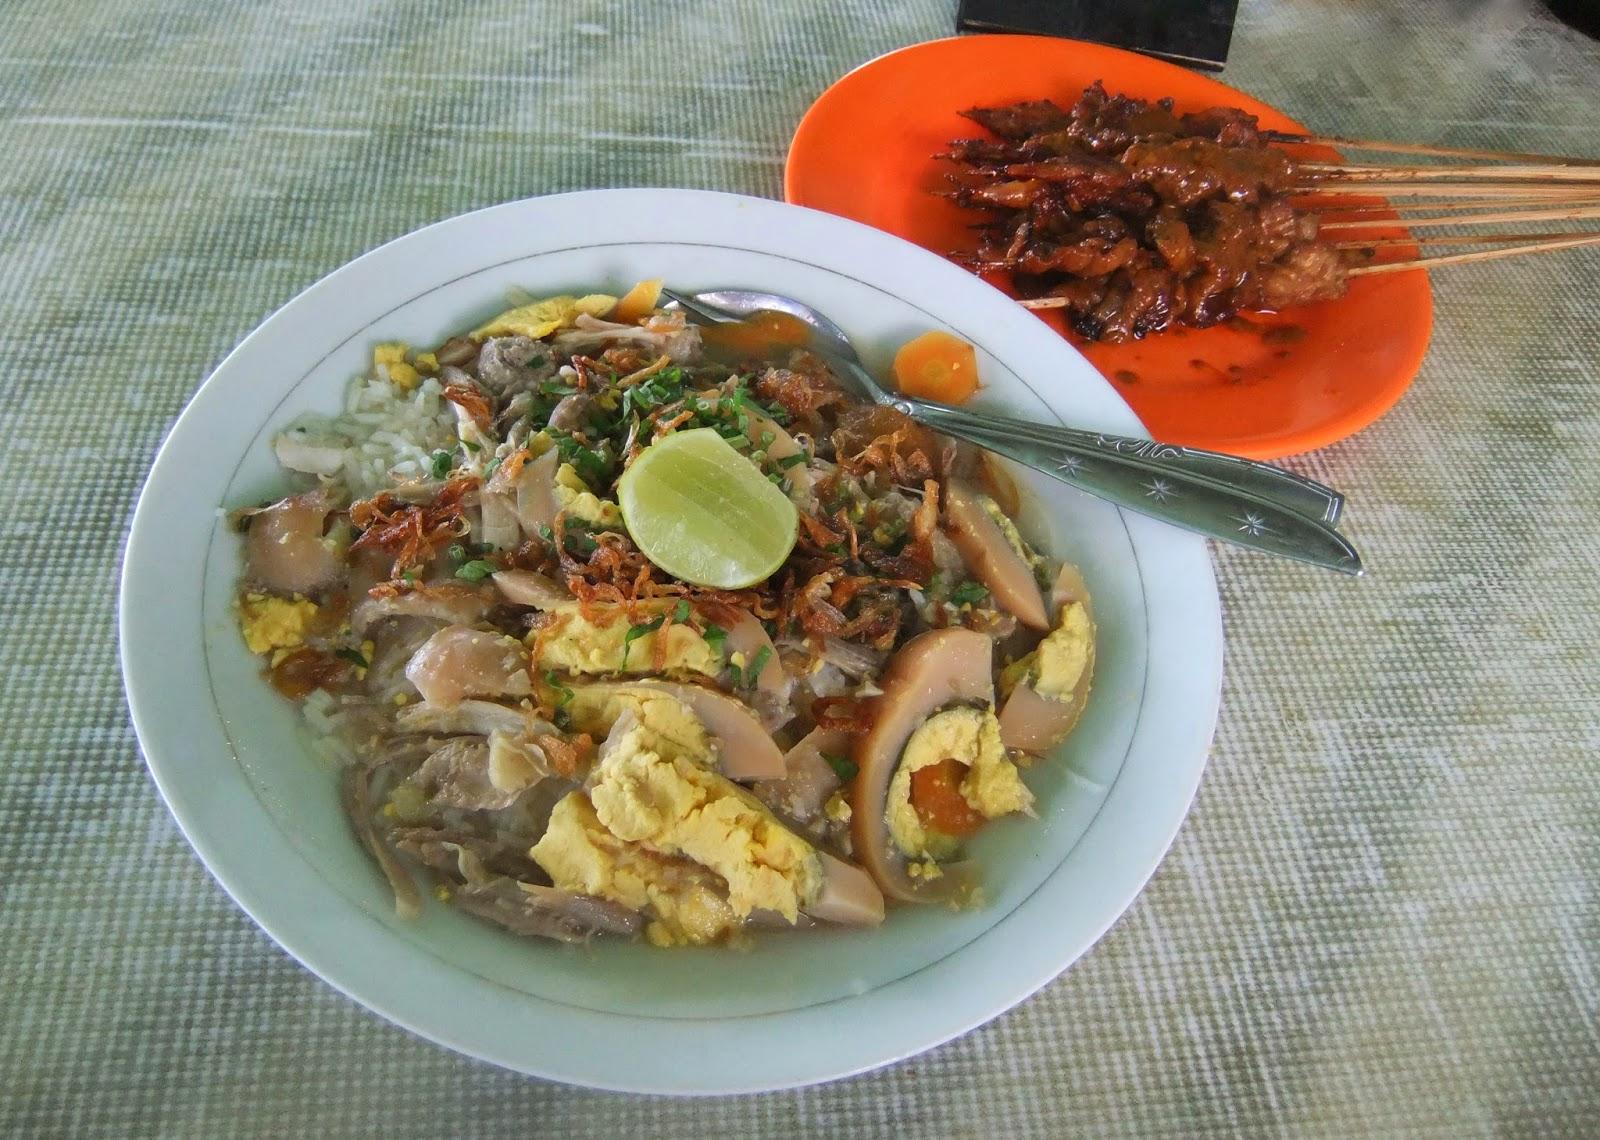 Resep Soto Banjar Yang Asli Sajian Sedap Khas Kalimantan